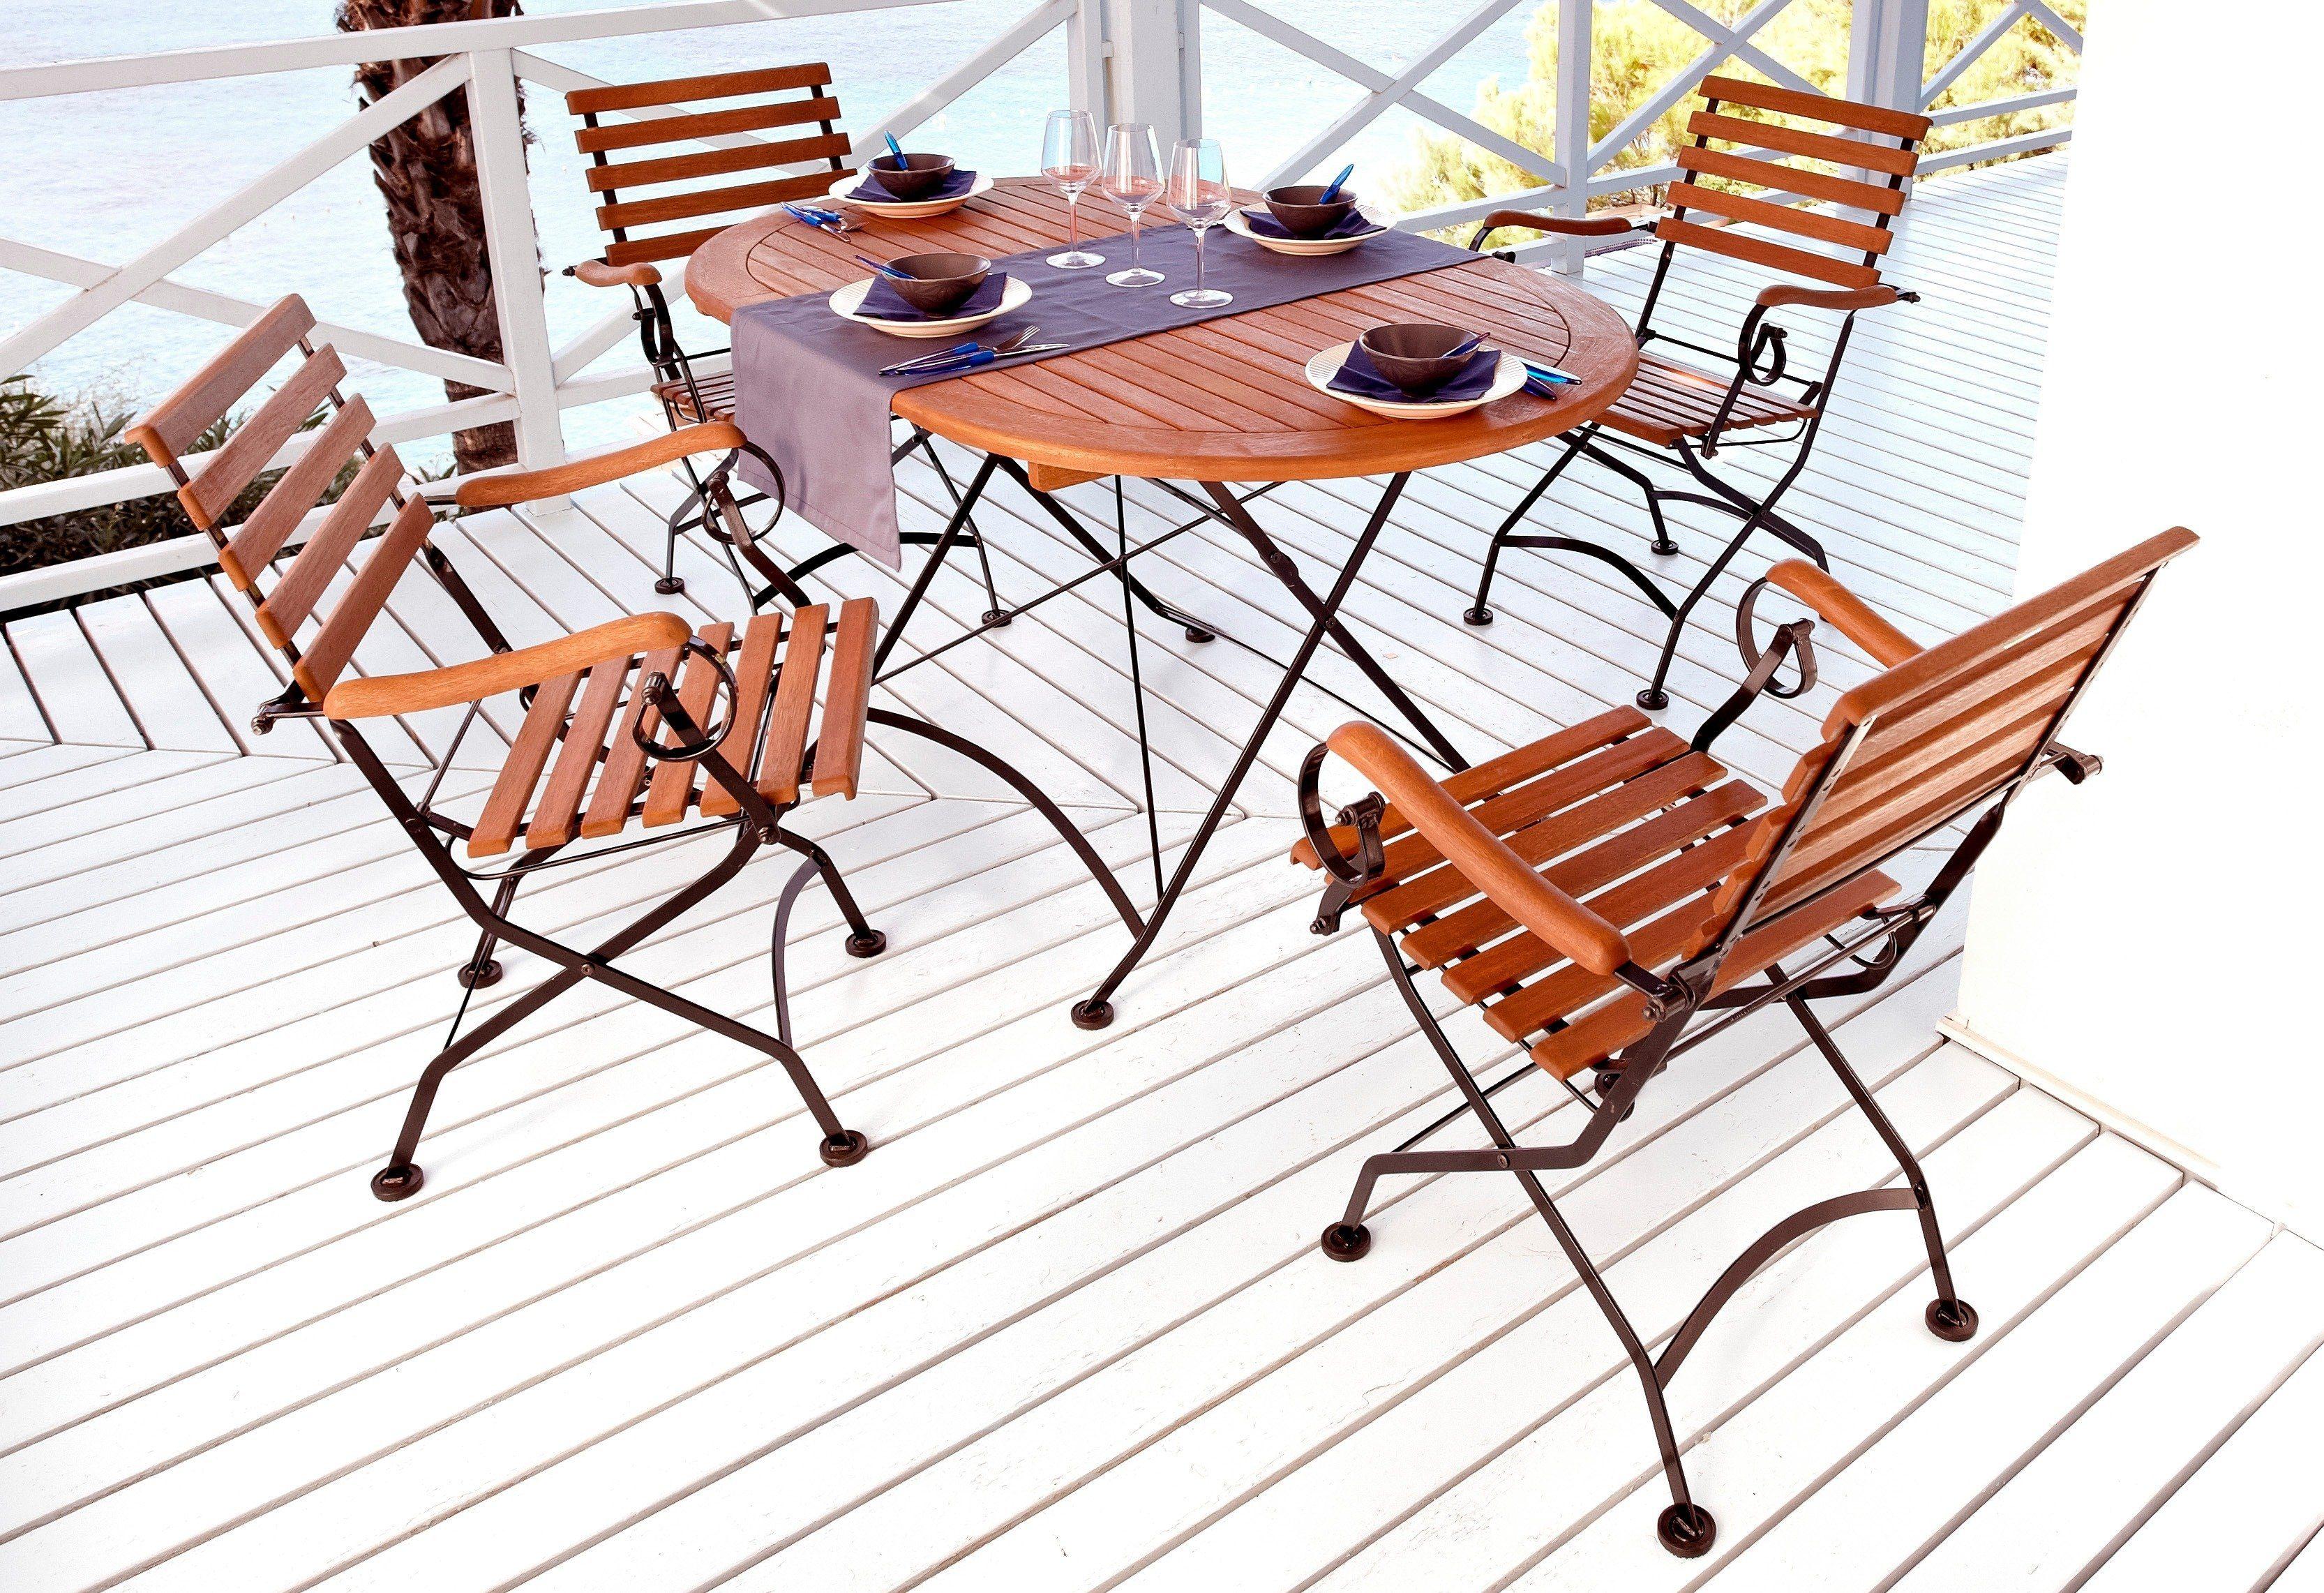 5-tgl. Gartenmöbelset »Schlossgarten«, 4 Sessel,ovaler Tisch, Stahl/Eukalyptusholz